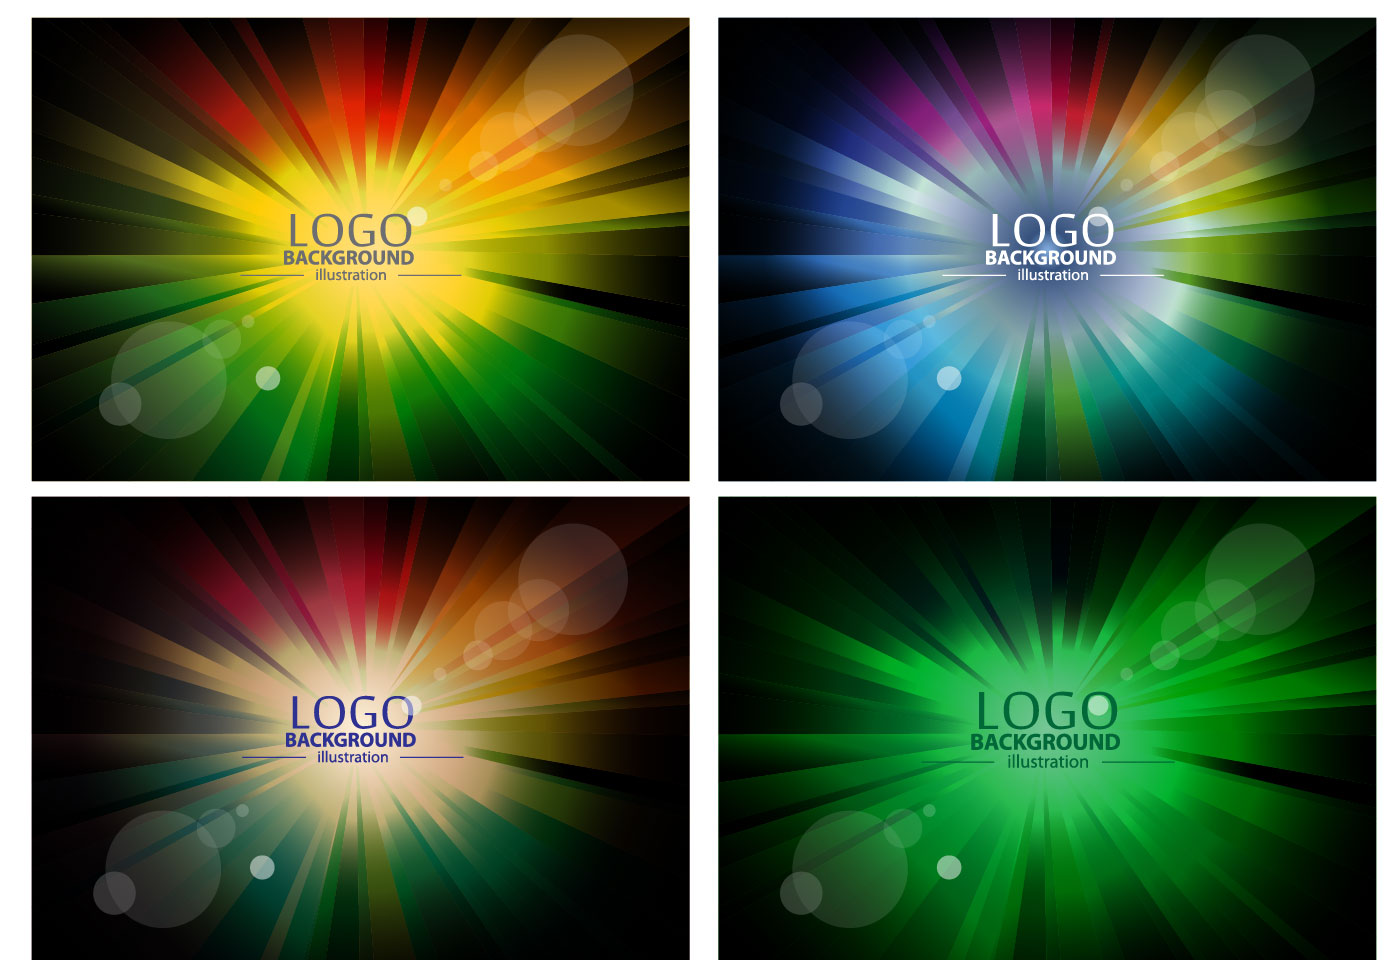 colorful logo background design vectors download free vector art